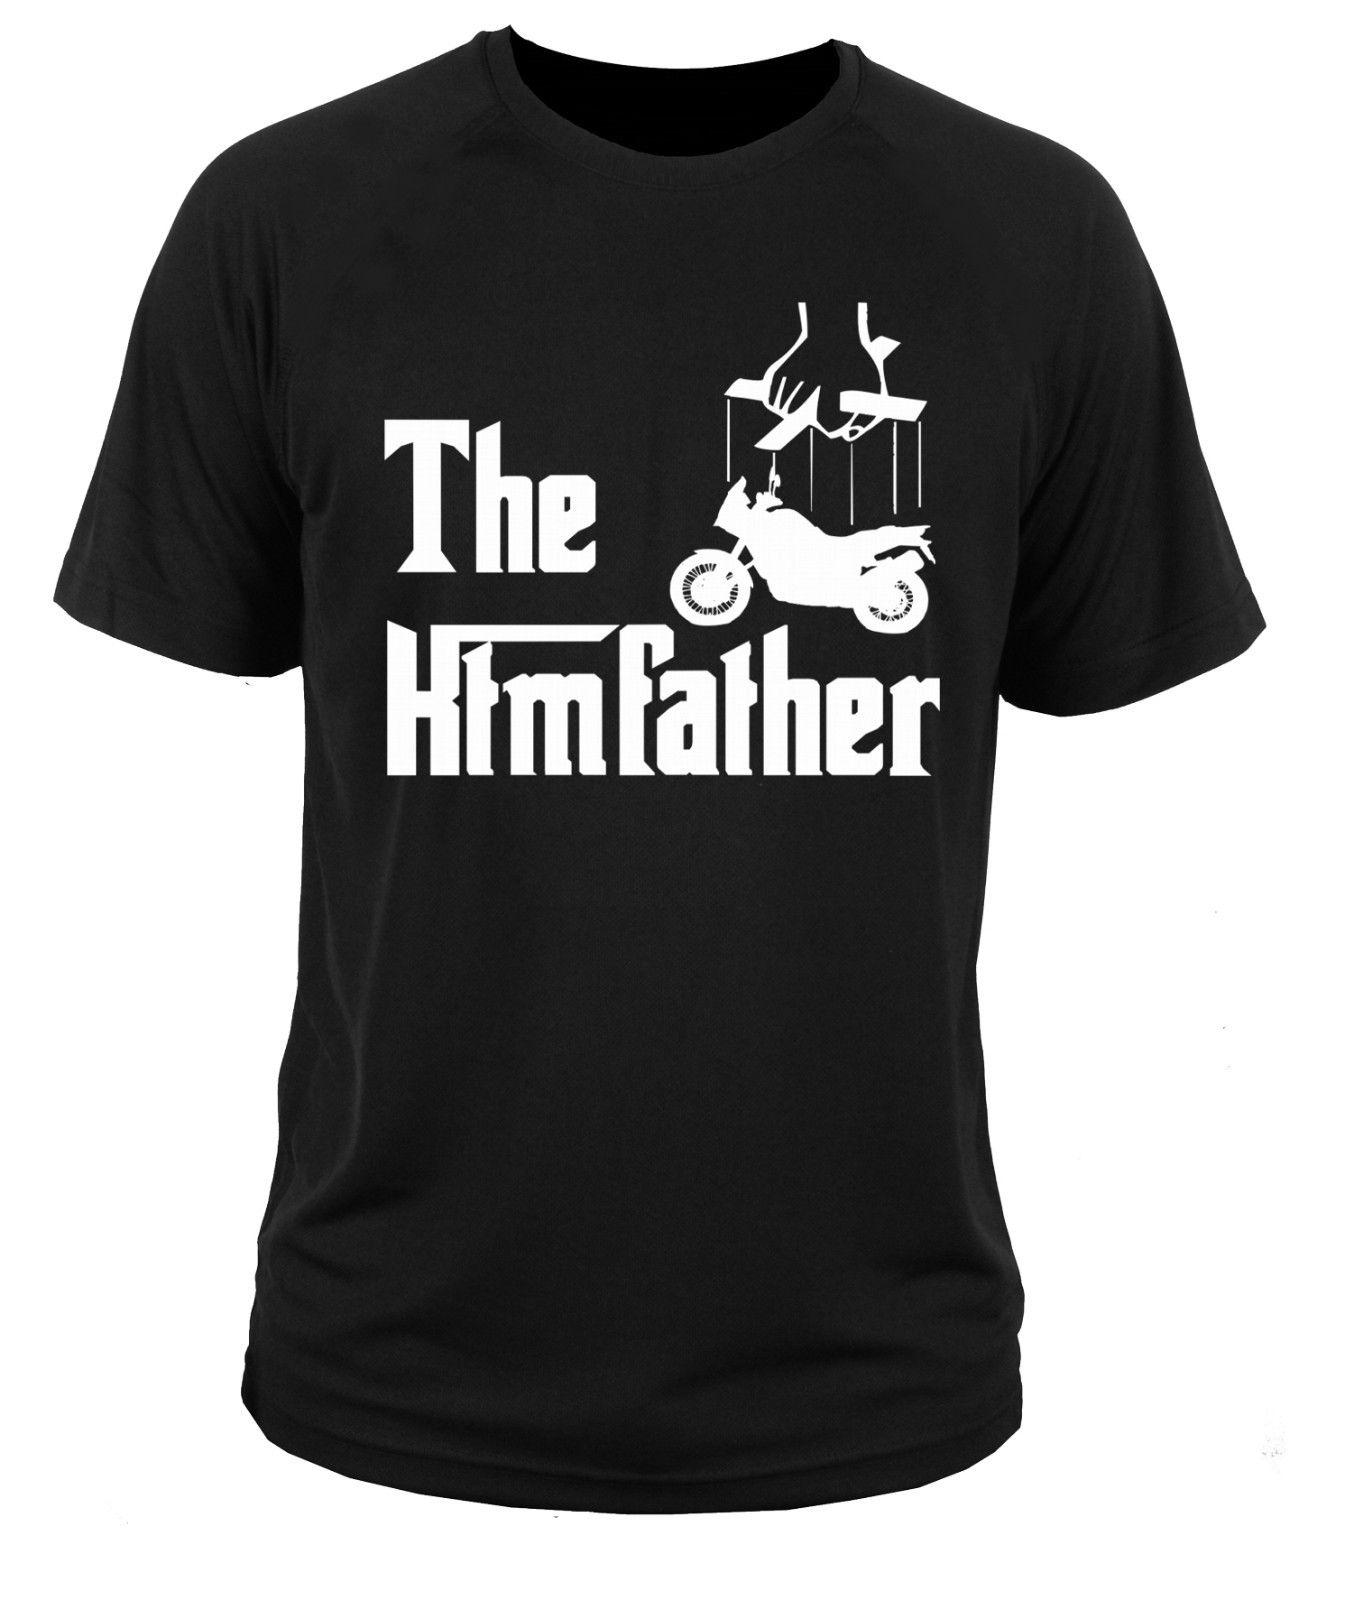 T shirt design quad cities - 2017 Newest Hipster Ktm Adventure 1290 1050 950 640 1200 1190 990 R Design Men S Tee